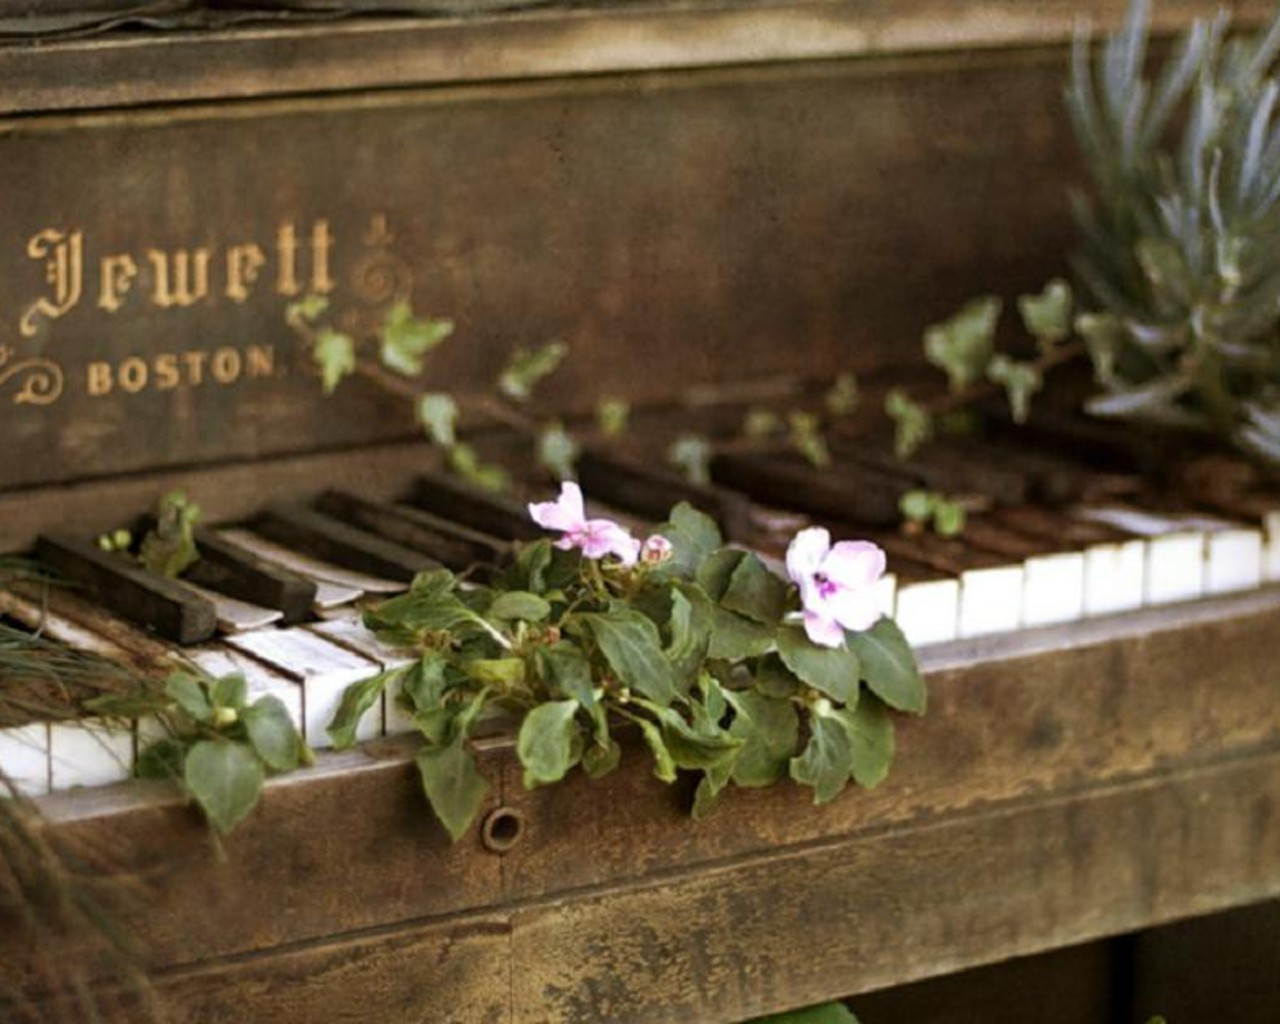 Piano Vintage Wallpaper 1280x1024 Photography Retro